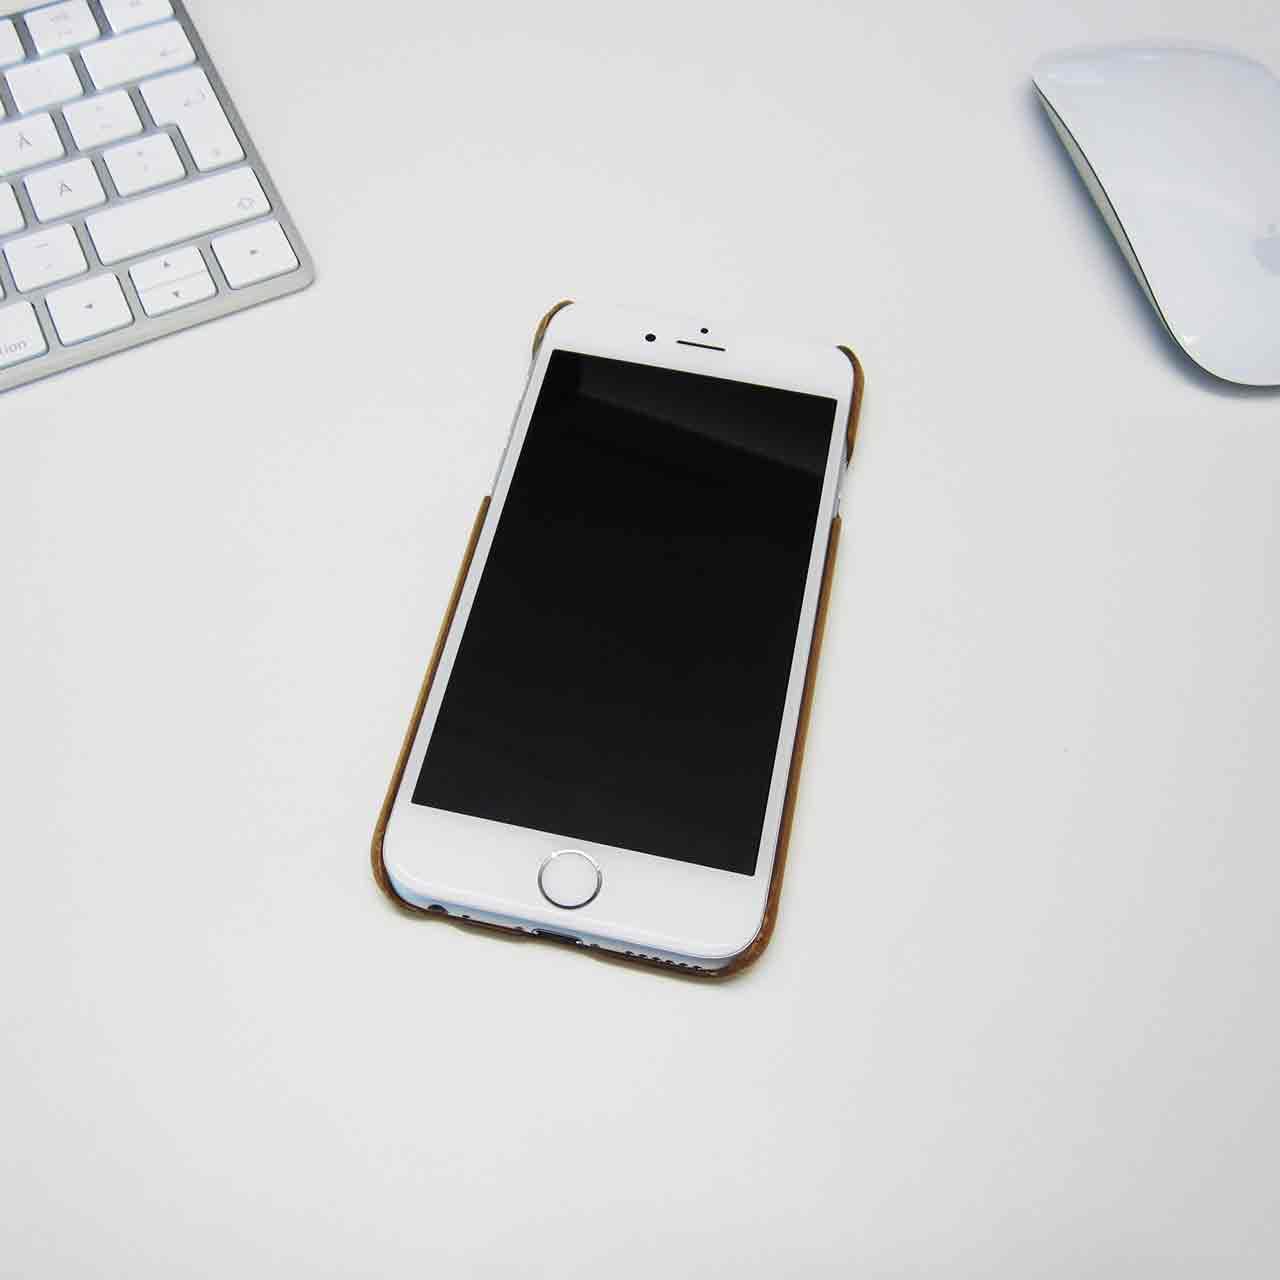 Skal till iPhone 6S gjord av trä